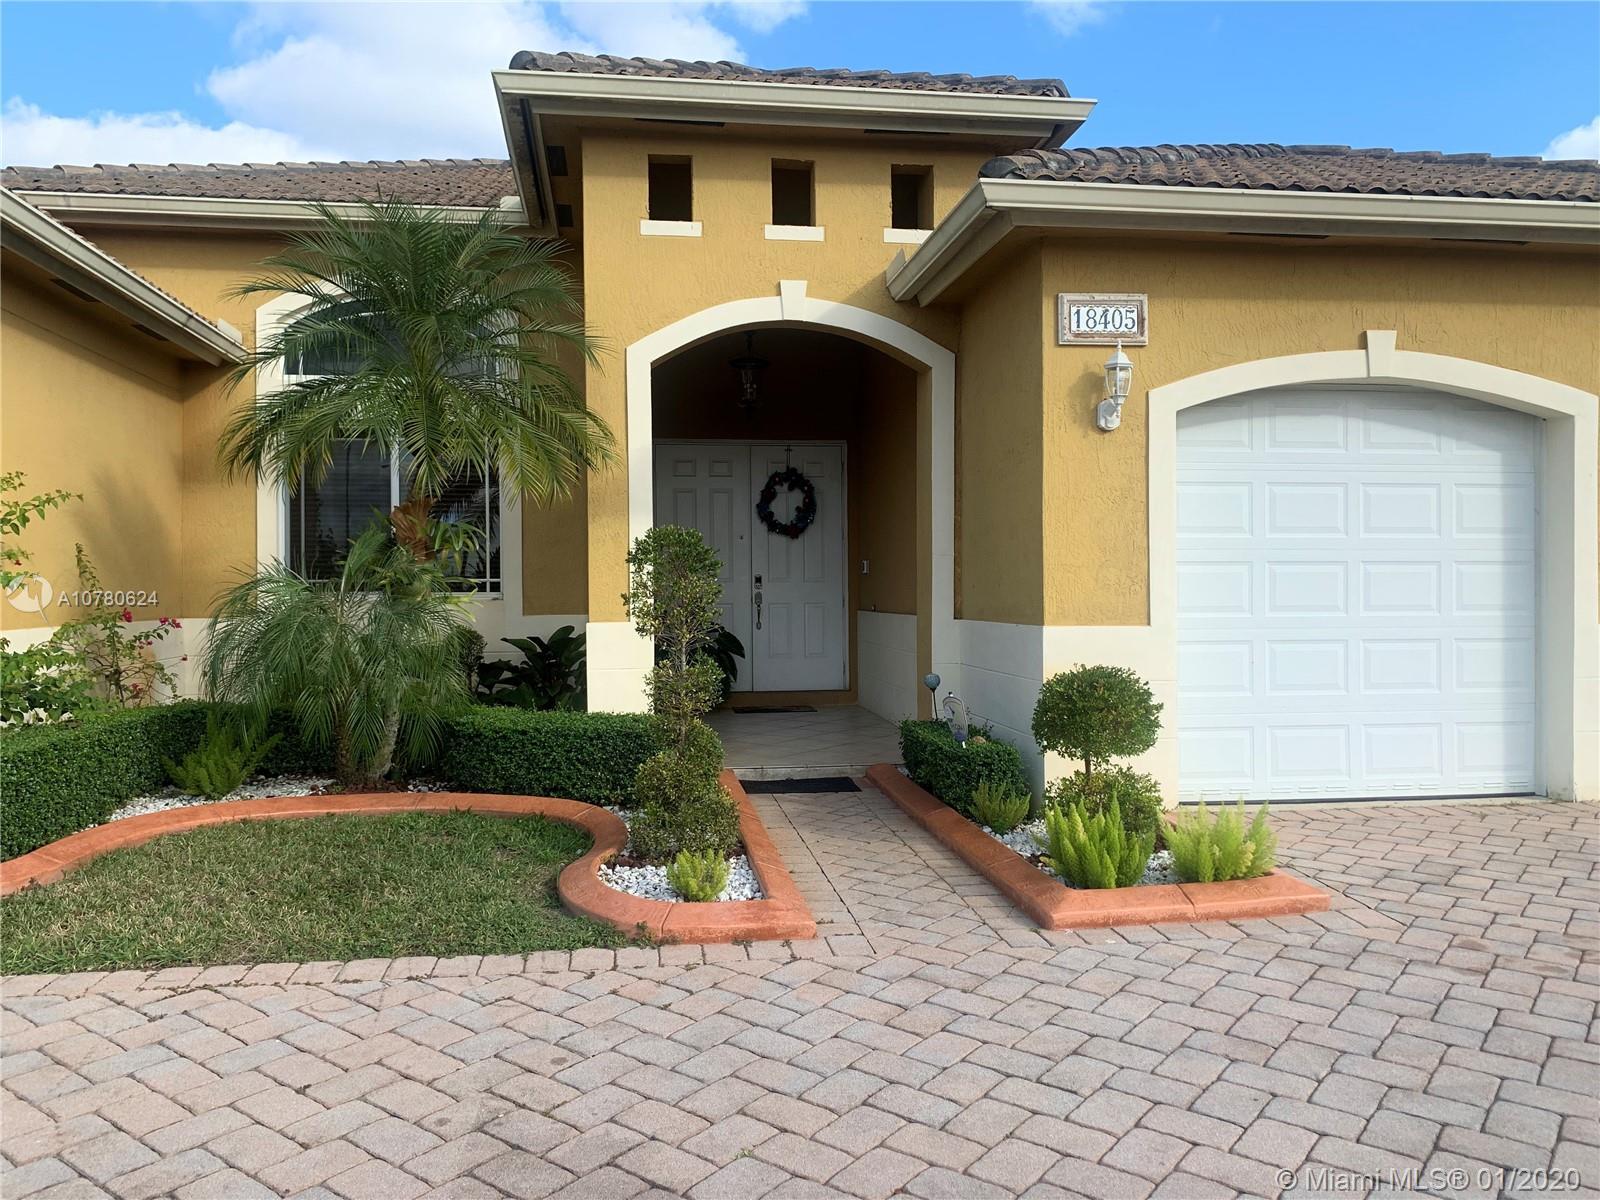 18405 SW 132nd Ave, Miami FL 33177